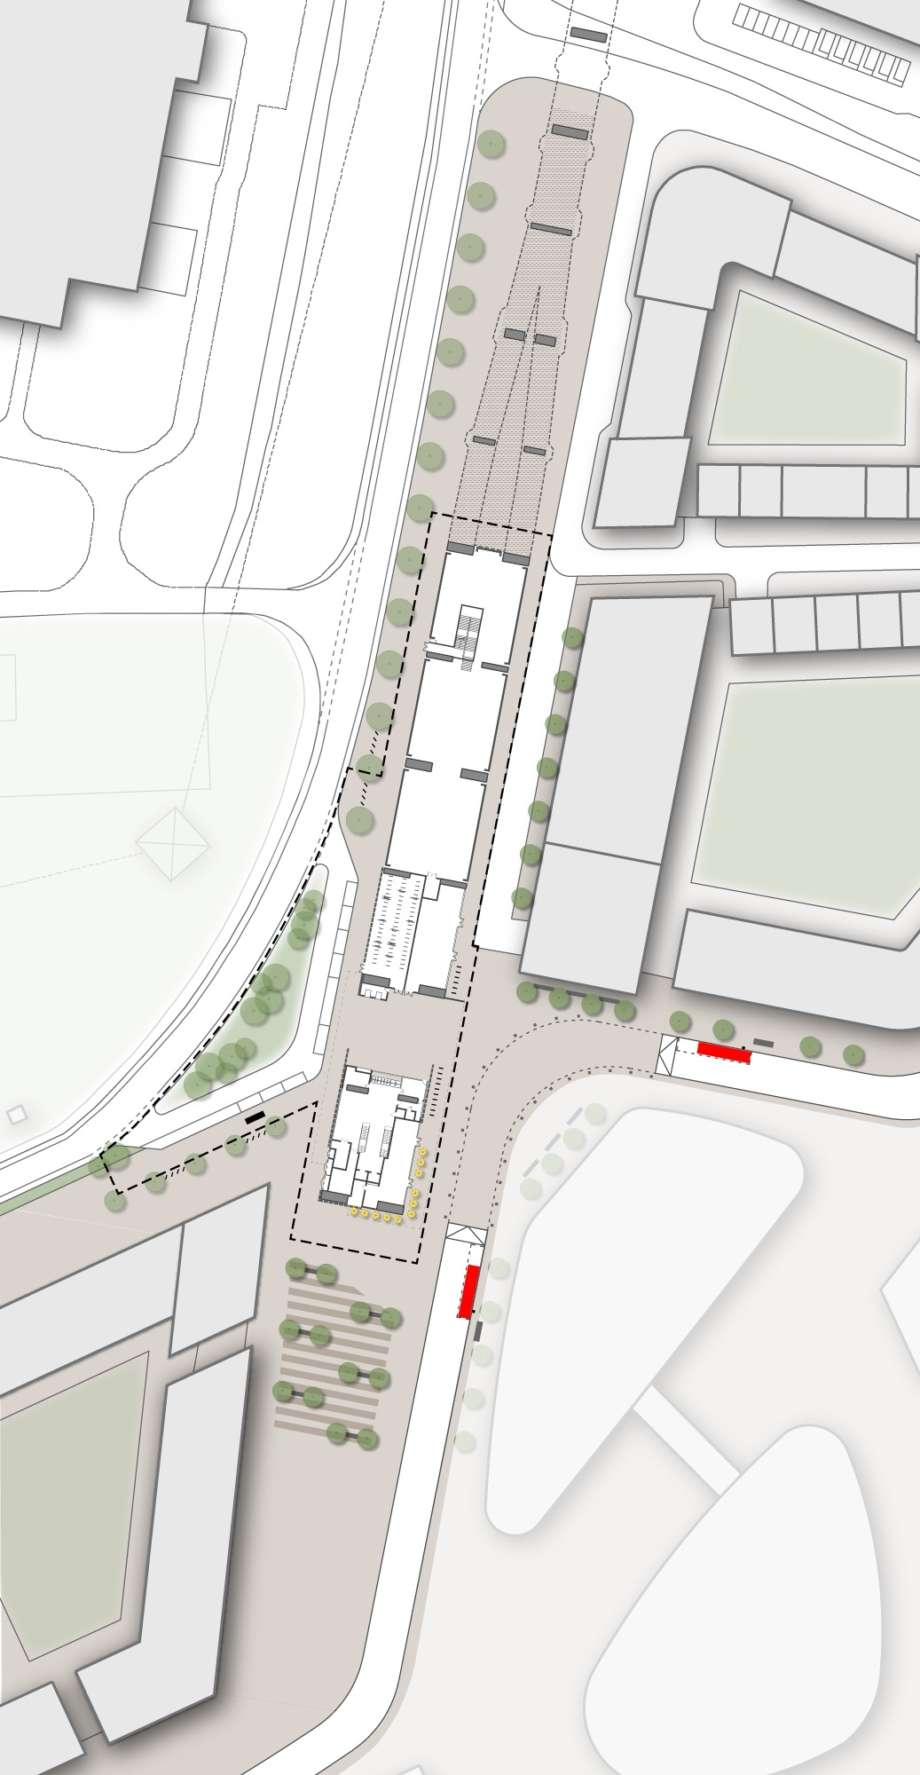 Barking Riverside Overground Extension